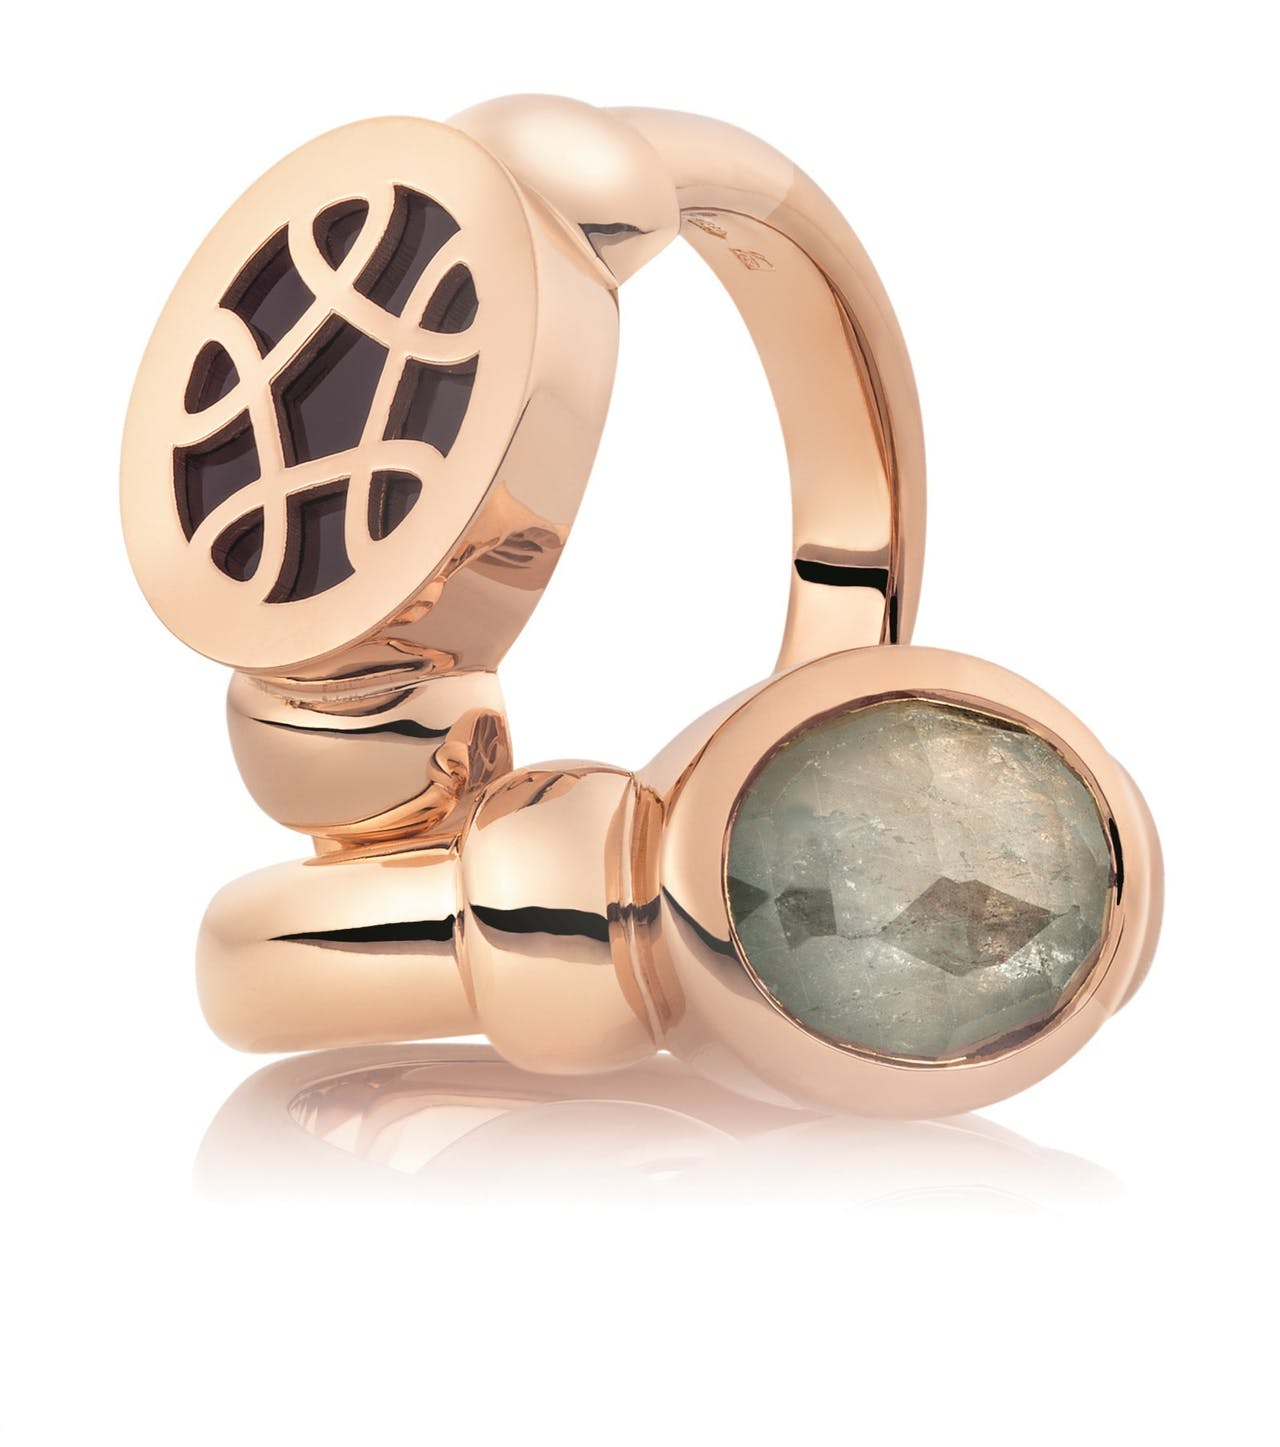 Piccolo-ring vanaf € 1750.